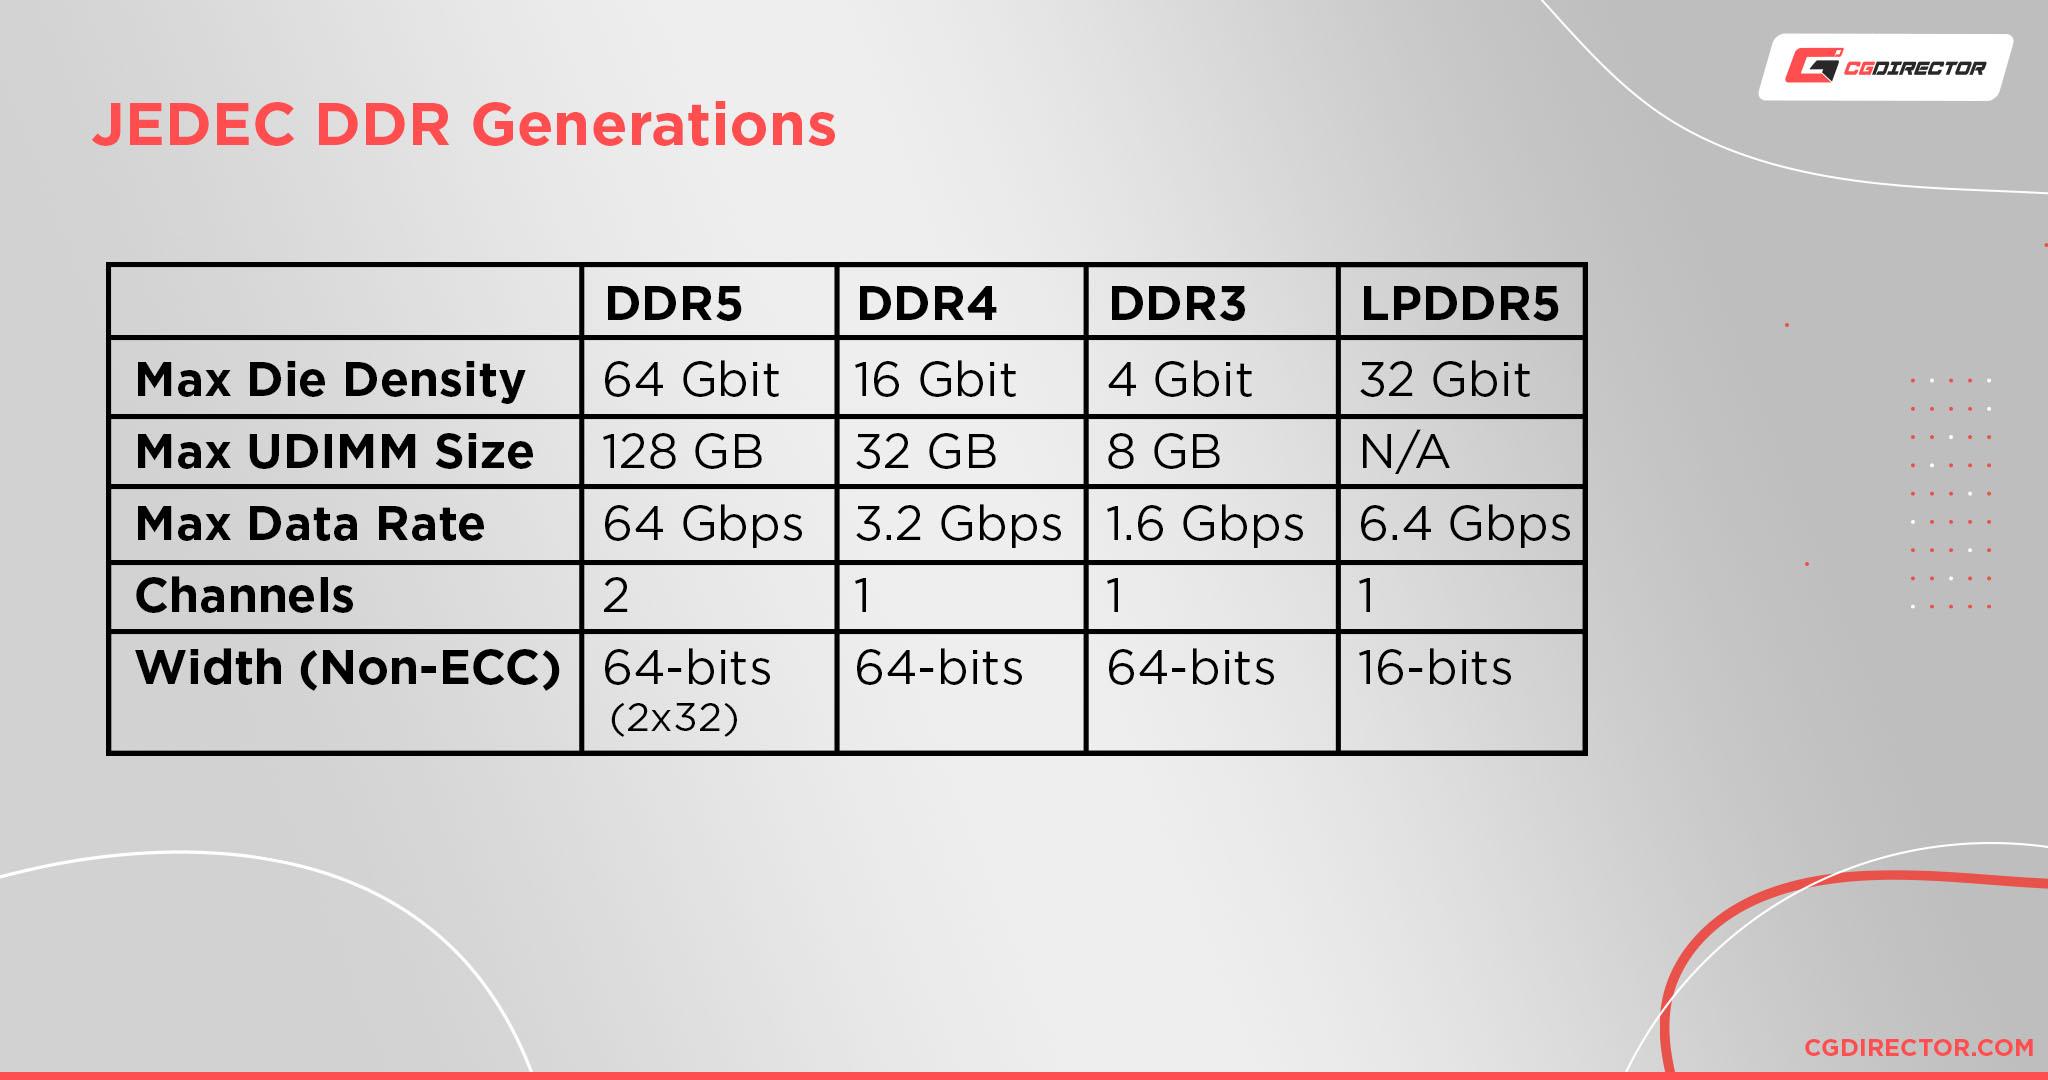 JEDEC DDR Generations